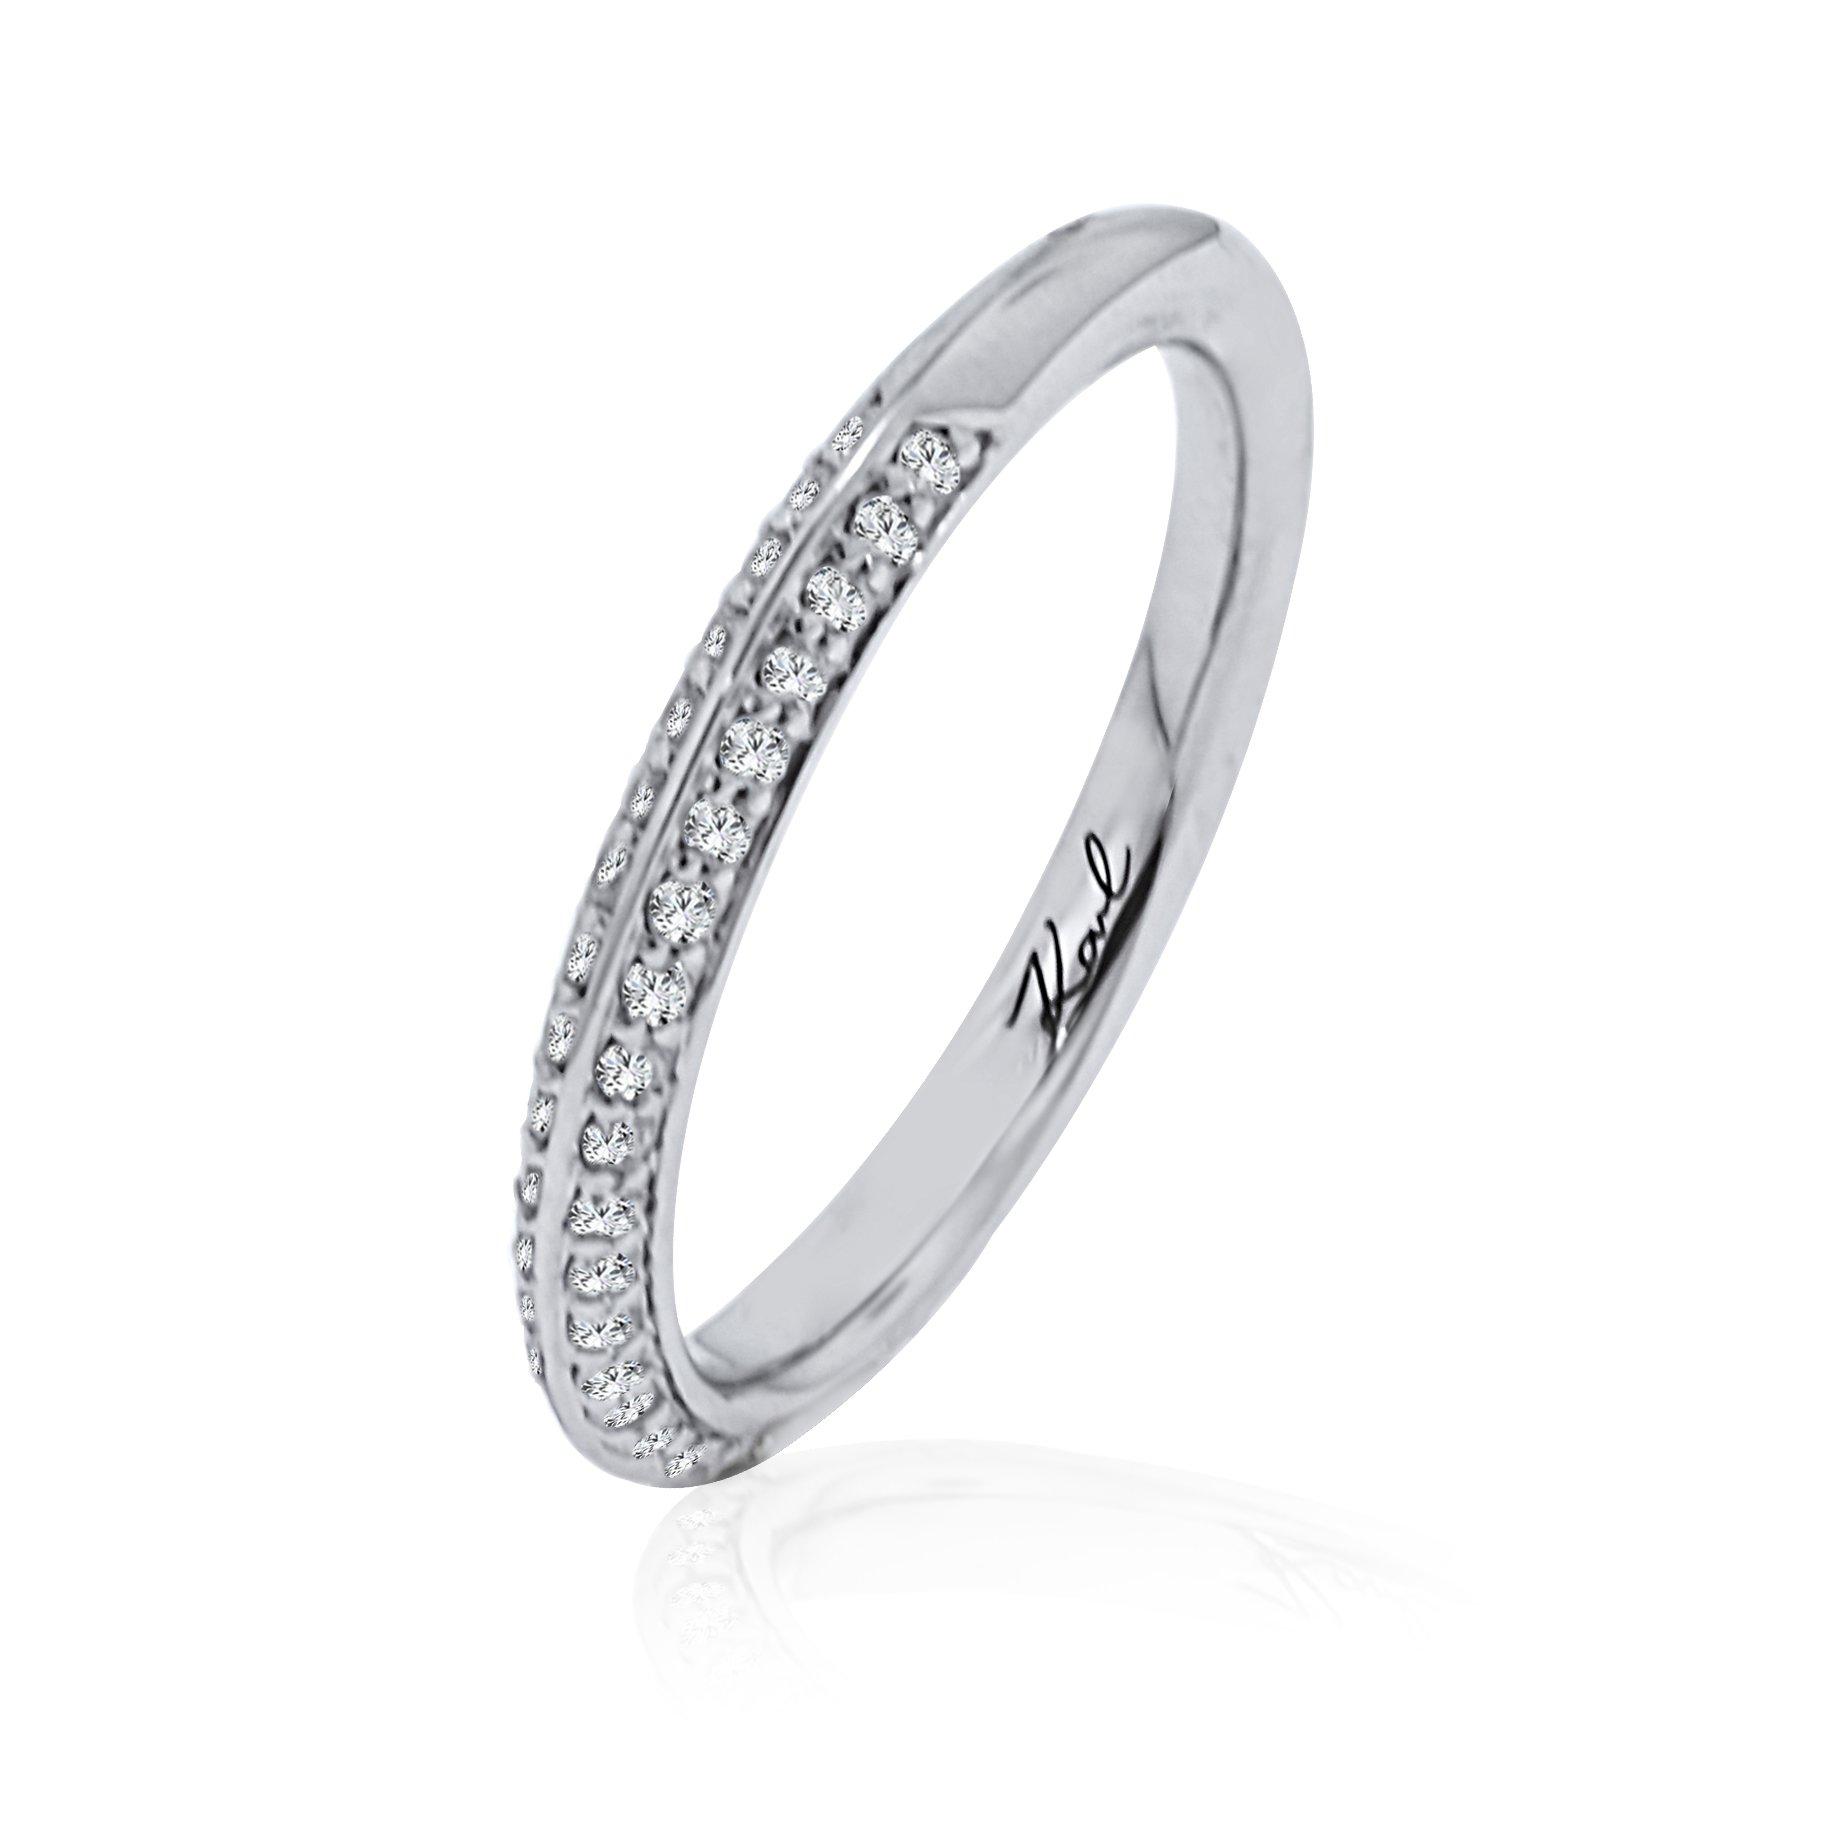 Karl Lagerfeld Diamond Pave Set 18K White Gold Womens Wedding